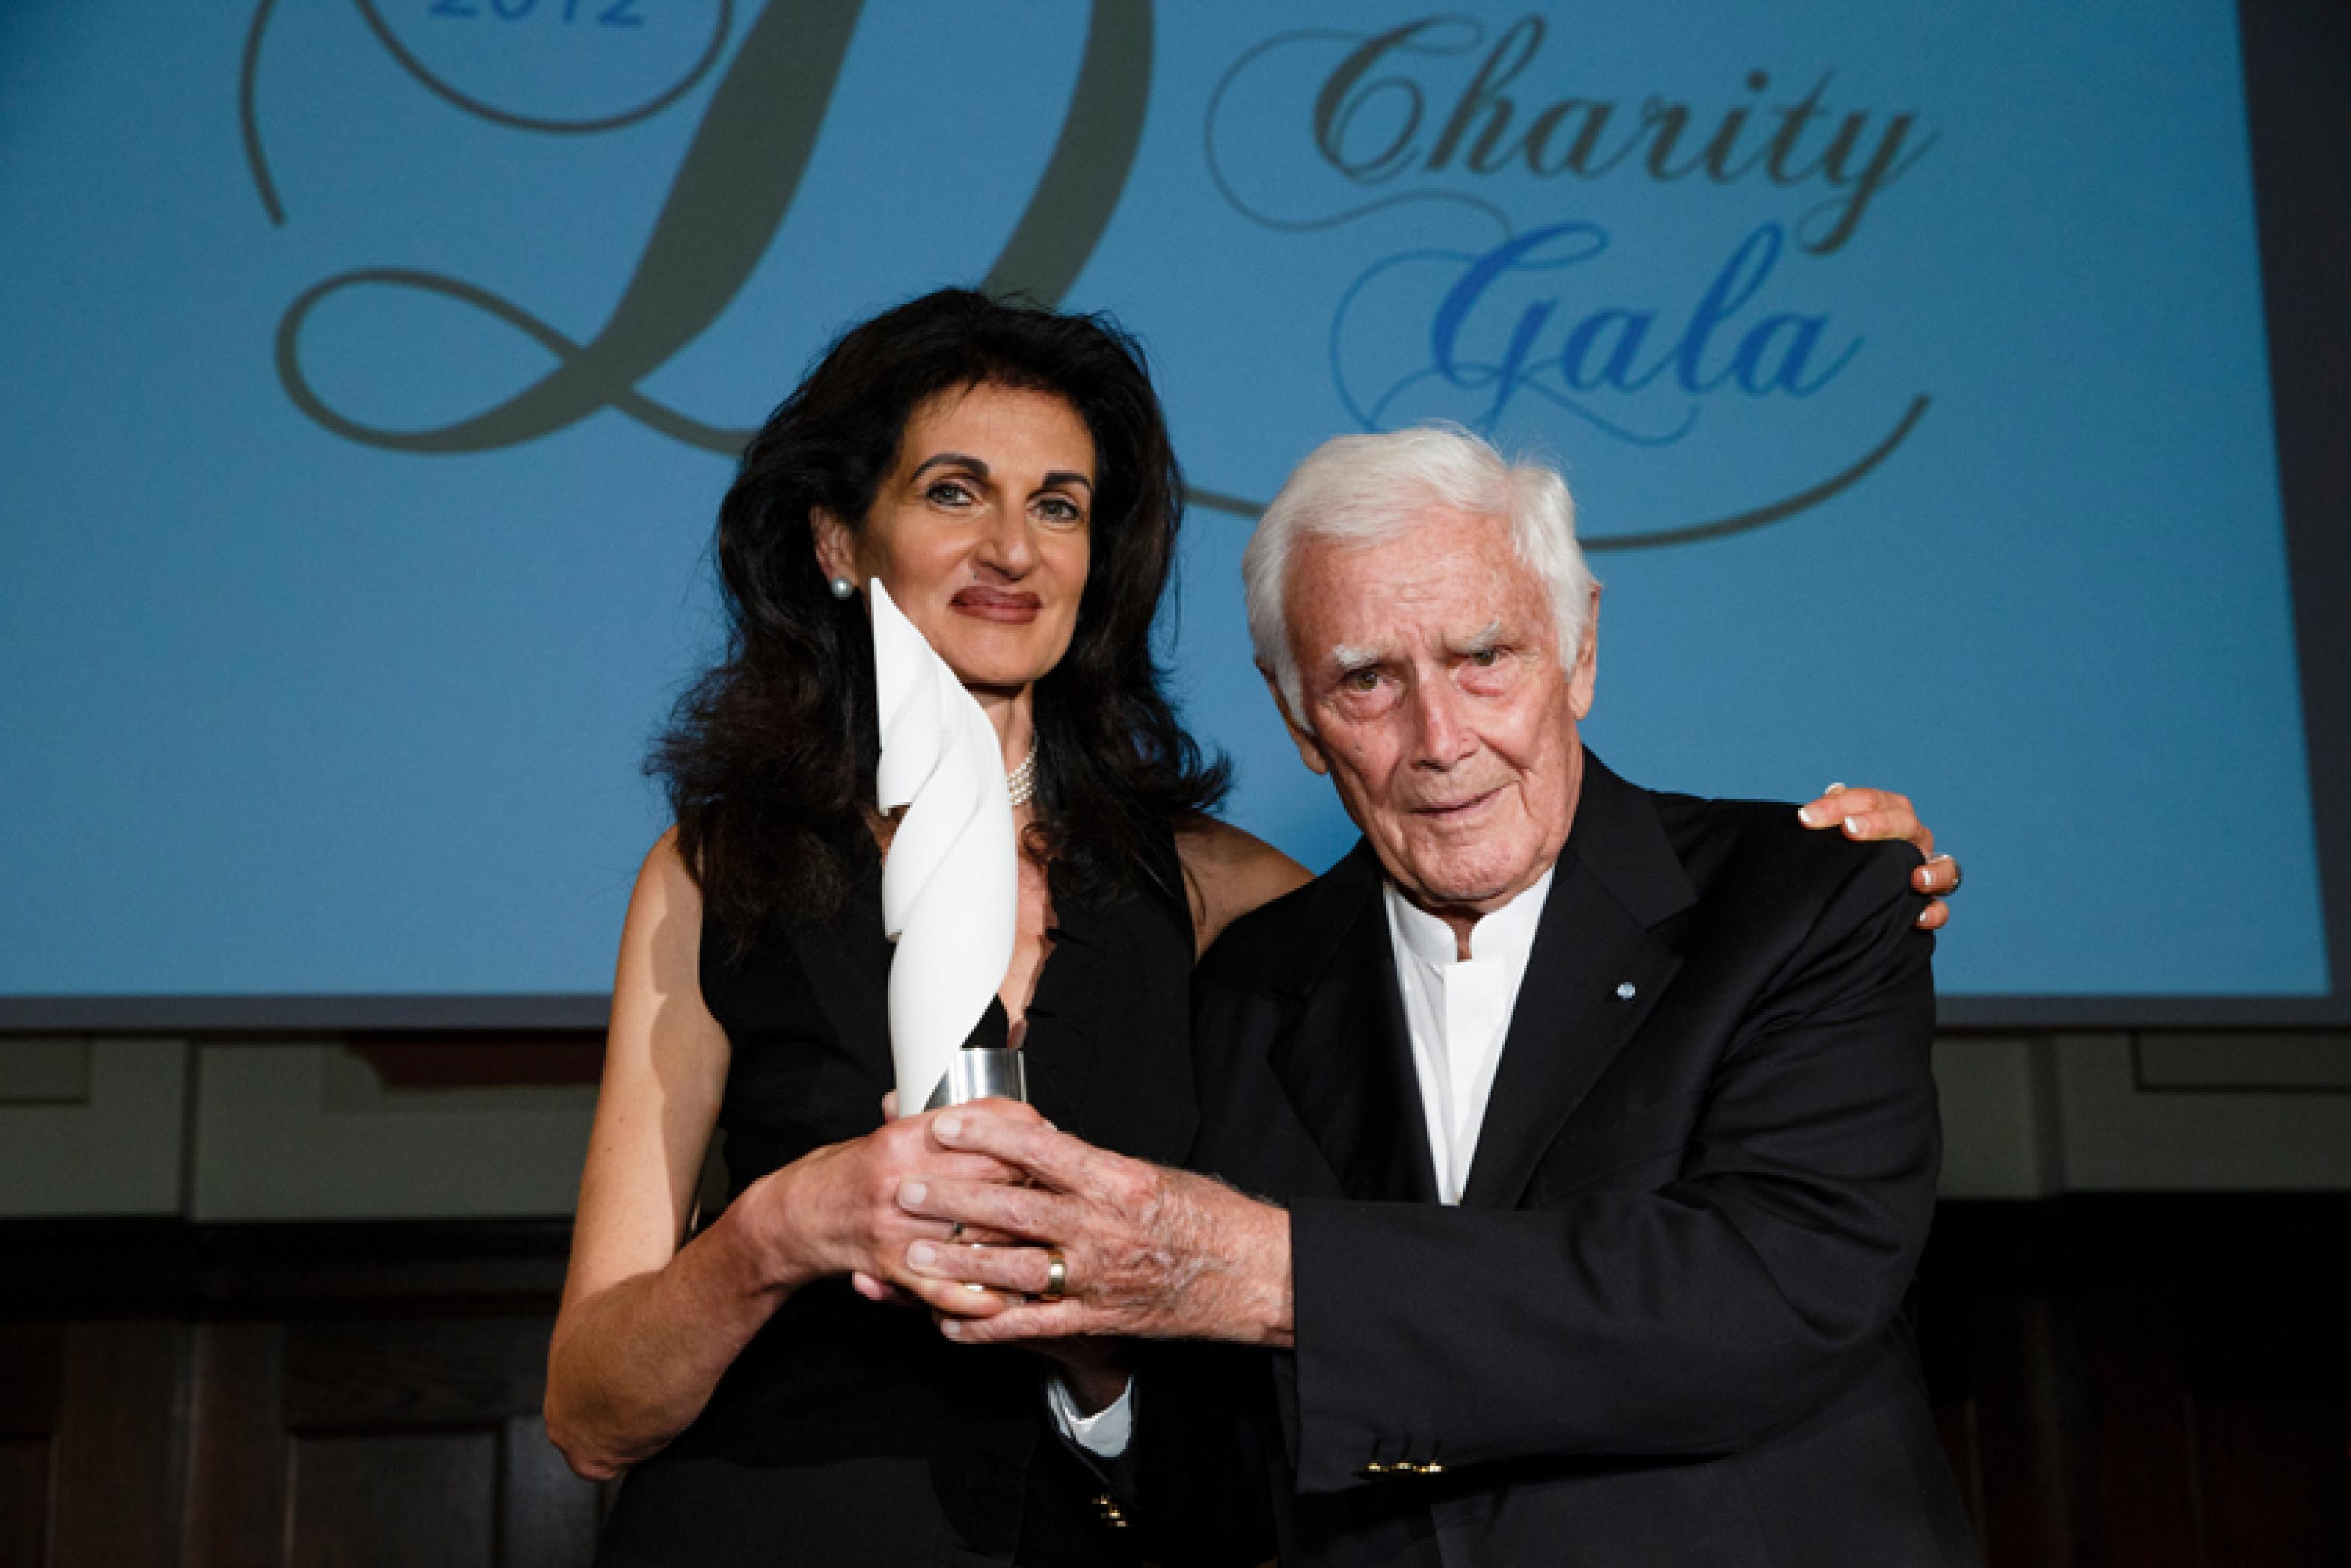 2. Diabetes-Charity-Gala, 18.10.2012 – Übergabe des Thomas-Fuchsberger-Preises an Ingrid Pfaff für ihre Stiftung Dianiño